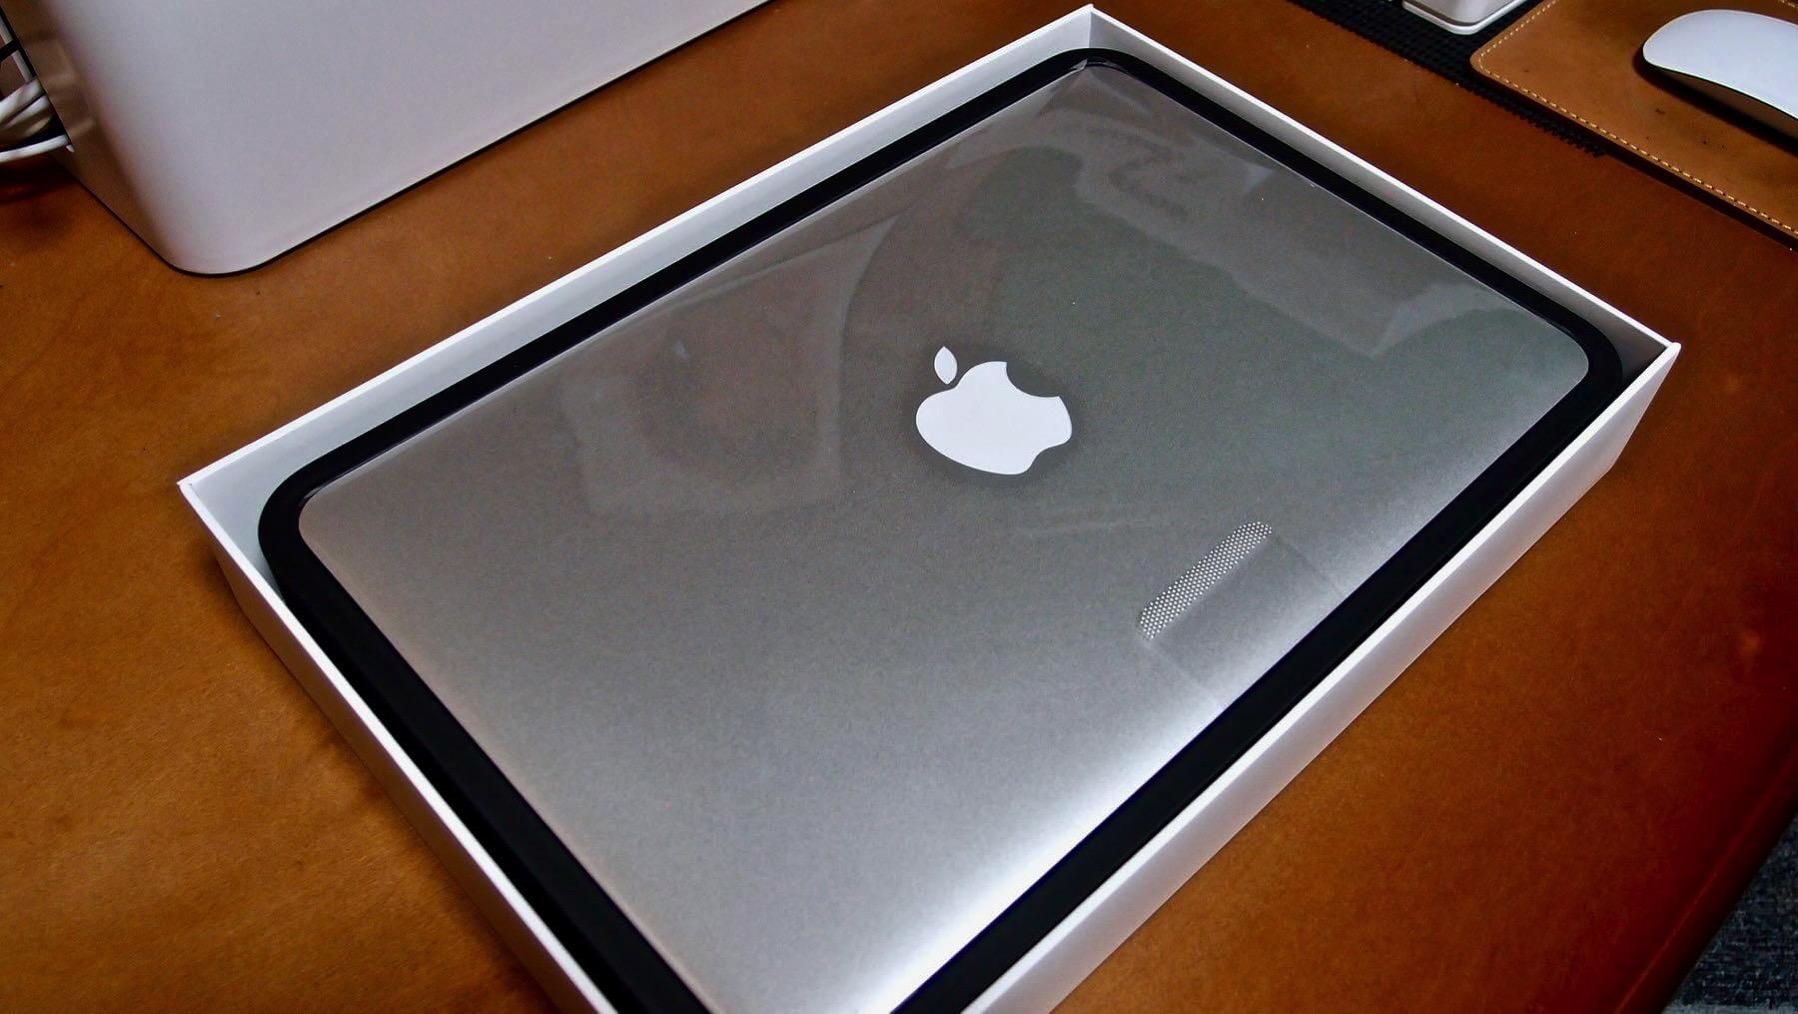 01 MacBook Air2013 Mid 11inch